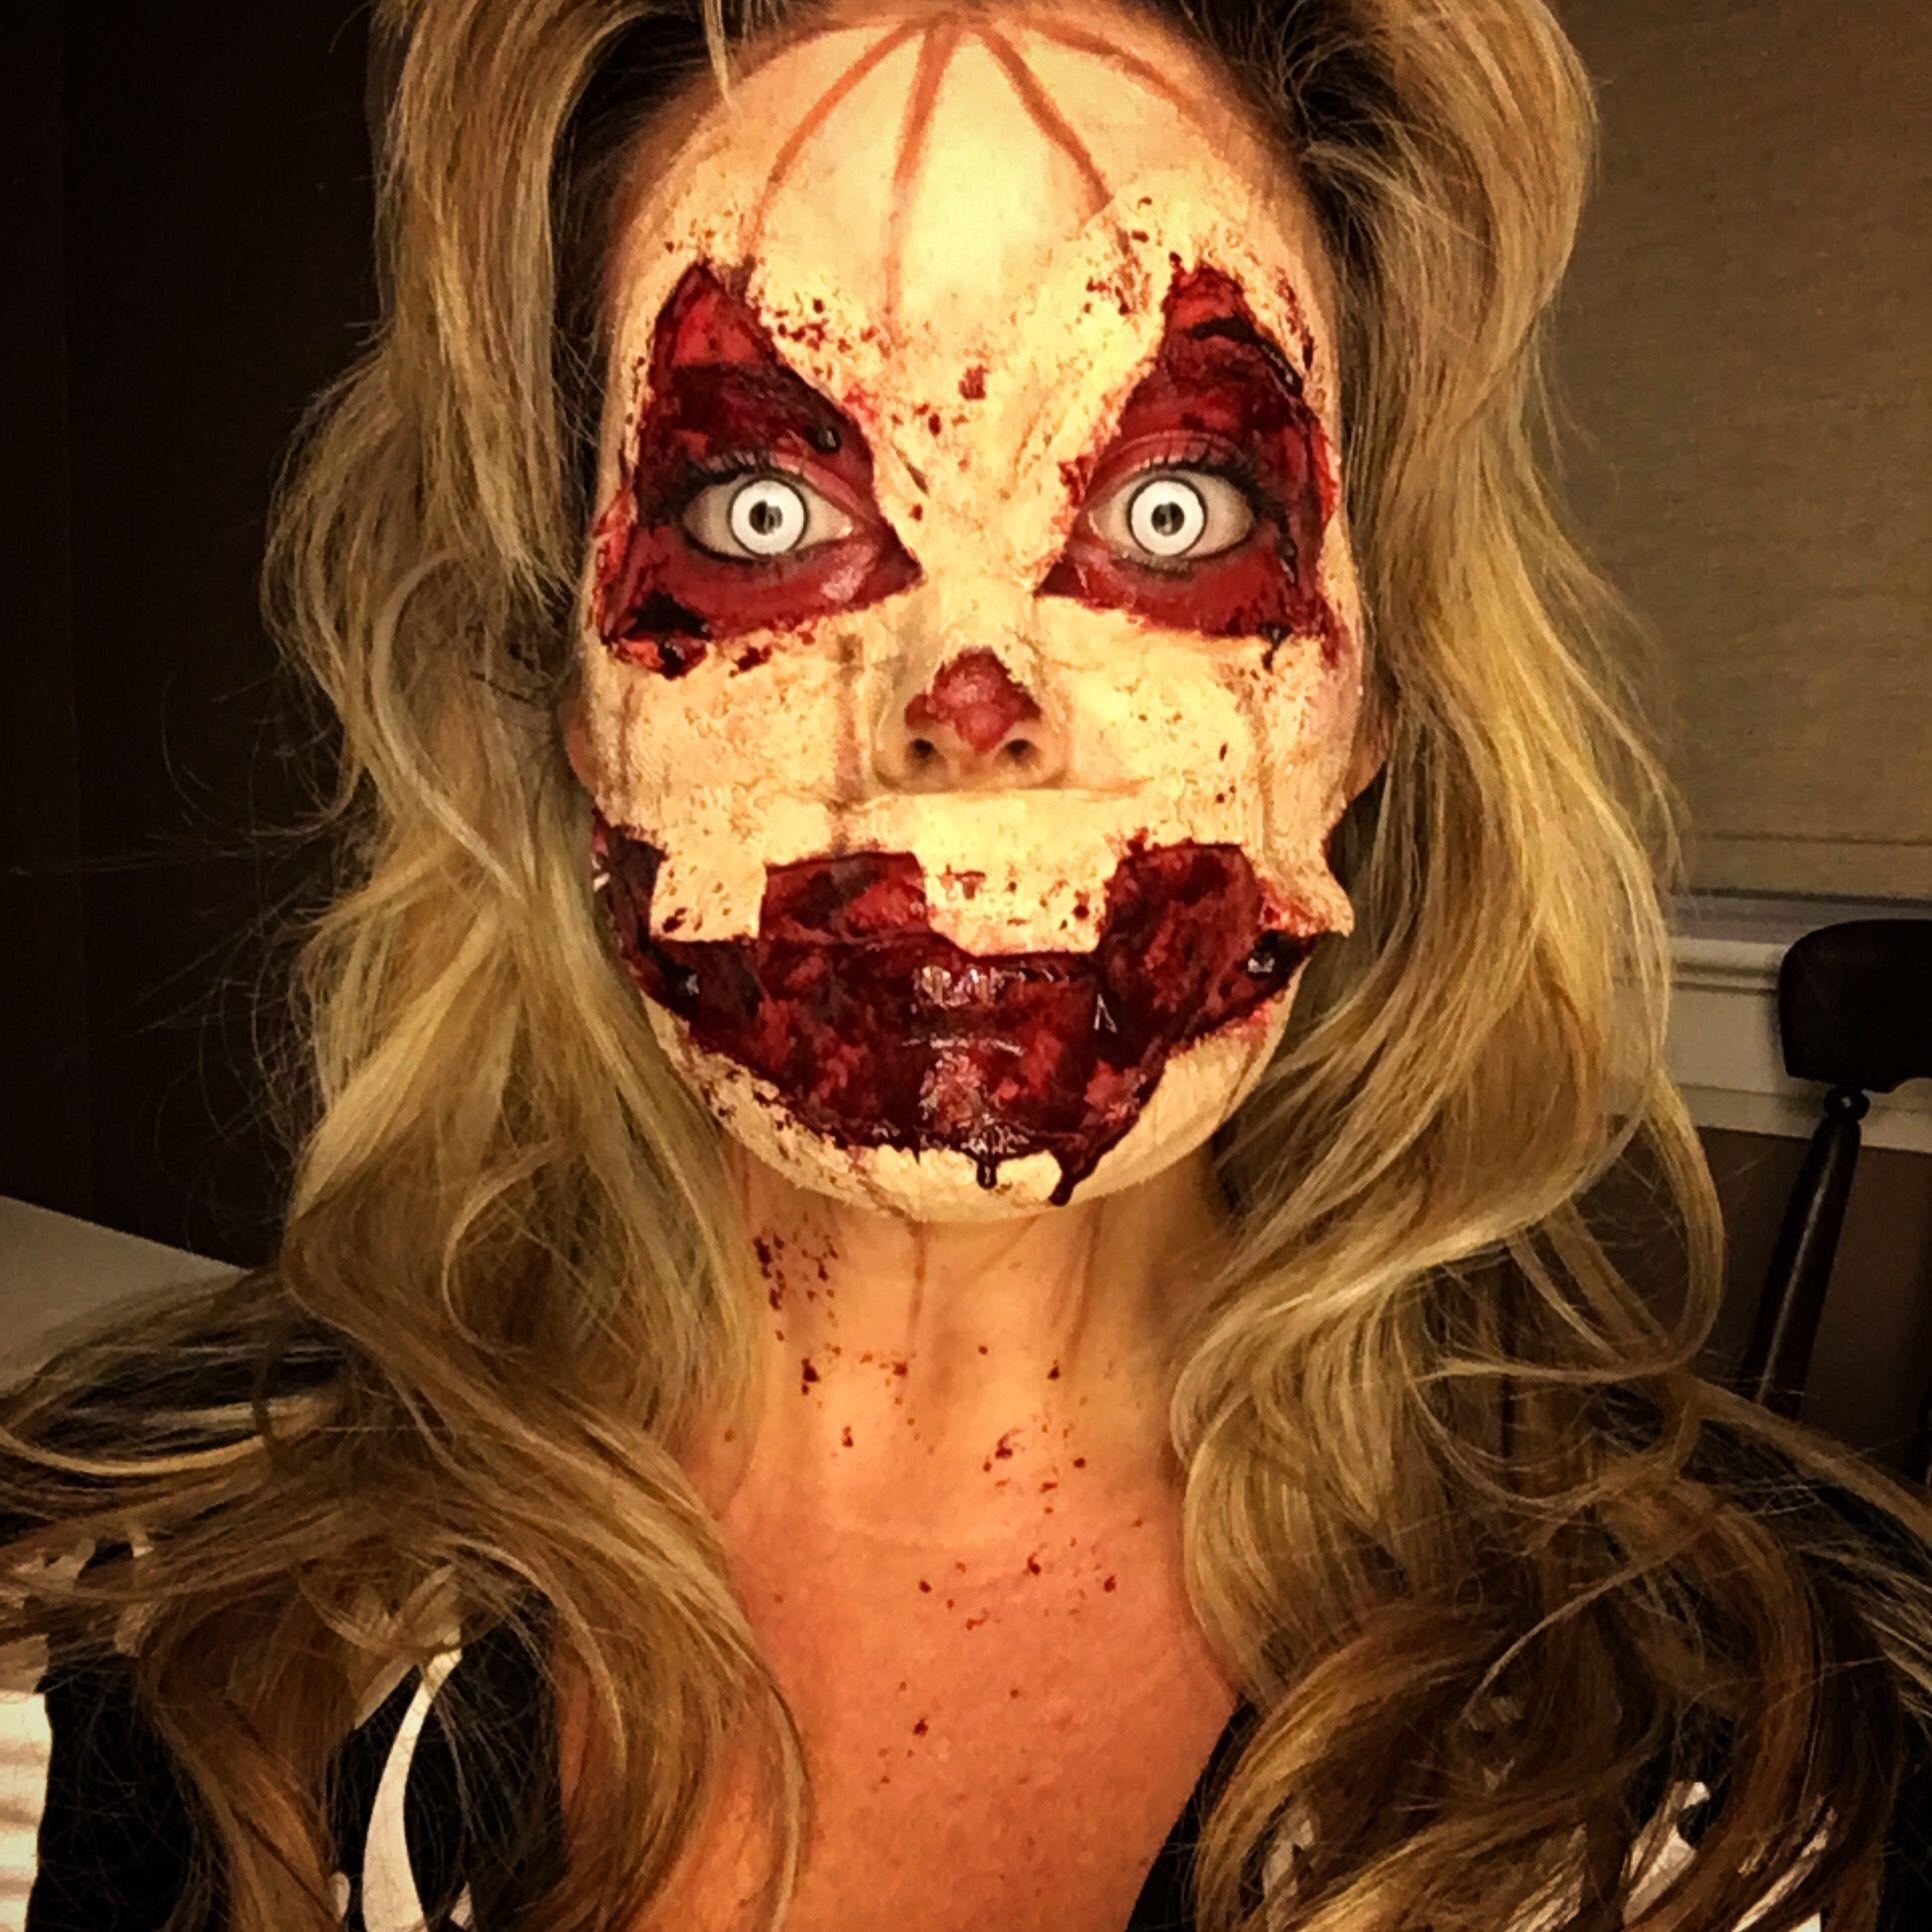 Scary pumpkin Halloween makeup. kimsnapshots on Instagram